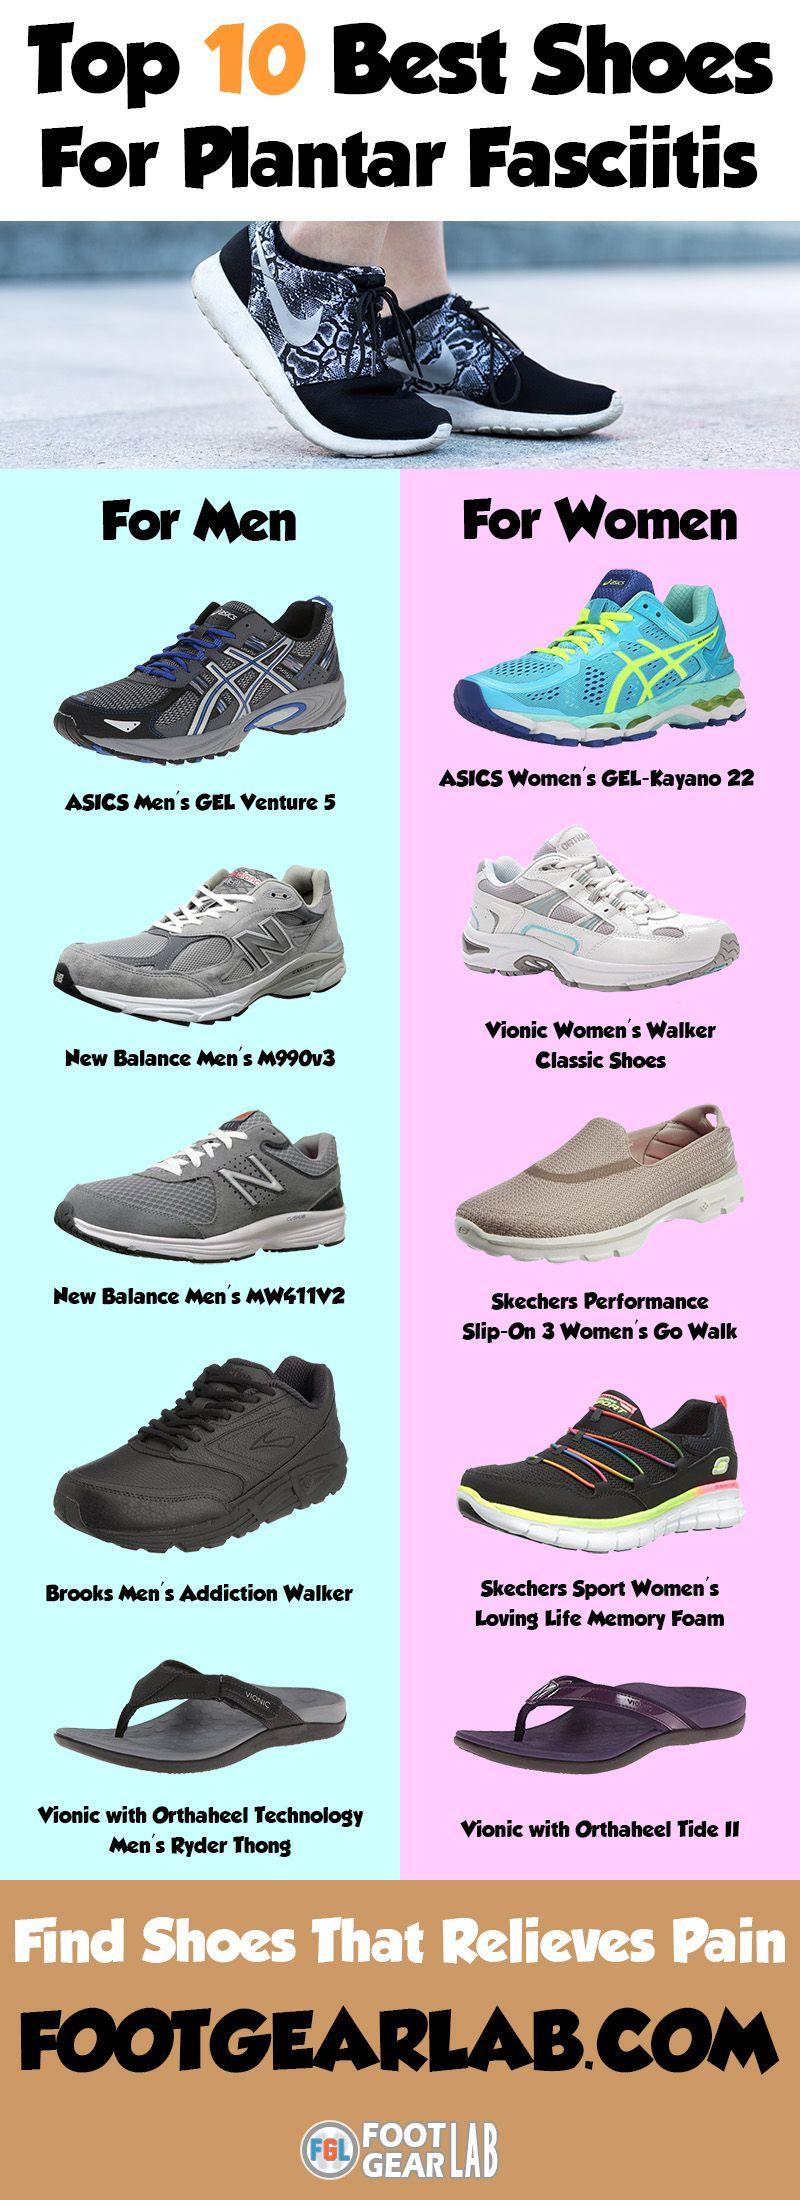 Women's sandals good for plantar fasciitis uk - Best Shoes For Plantar Fasciitis In 2017 Find Shoes That Relieves Pain